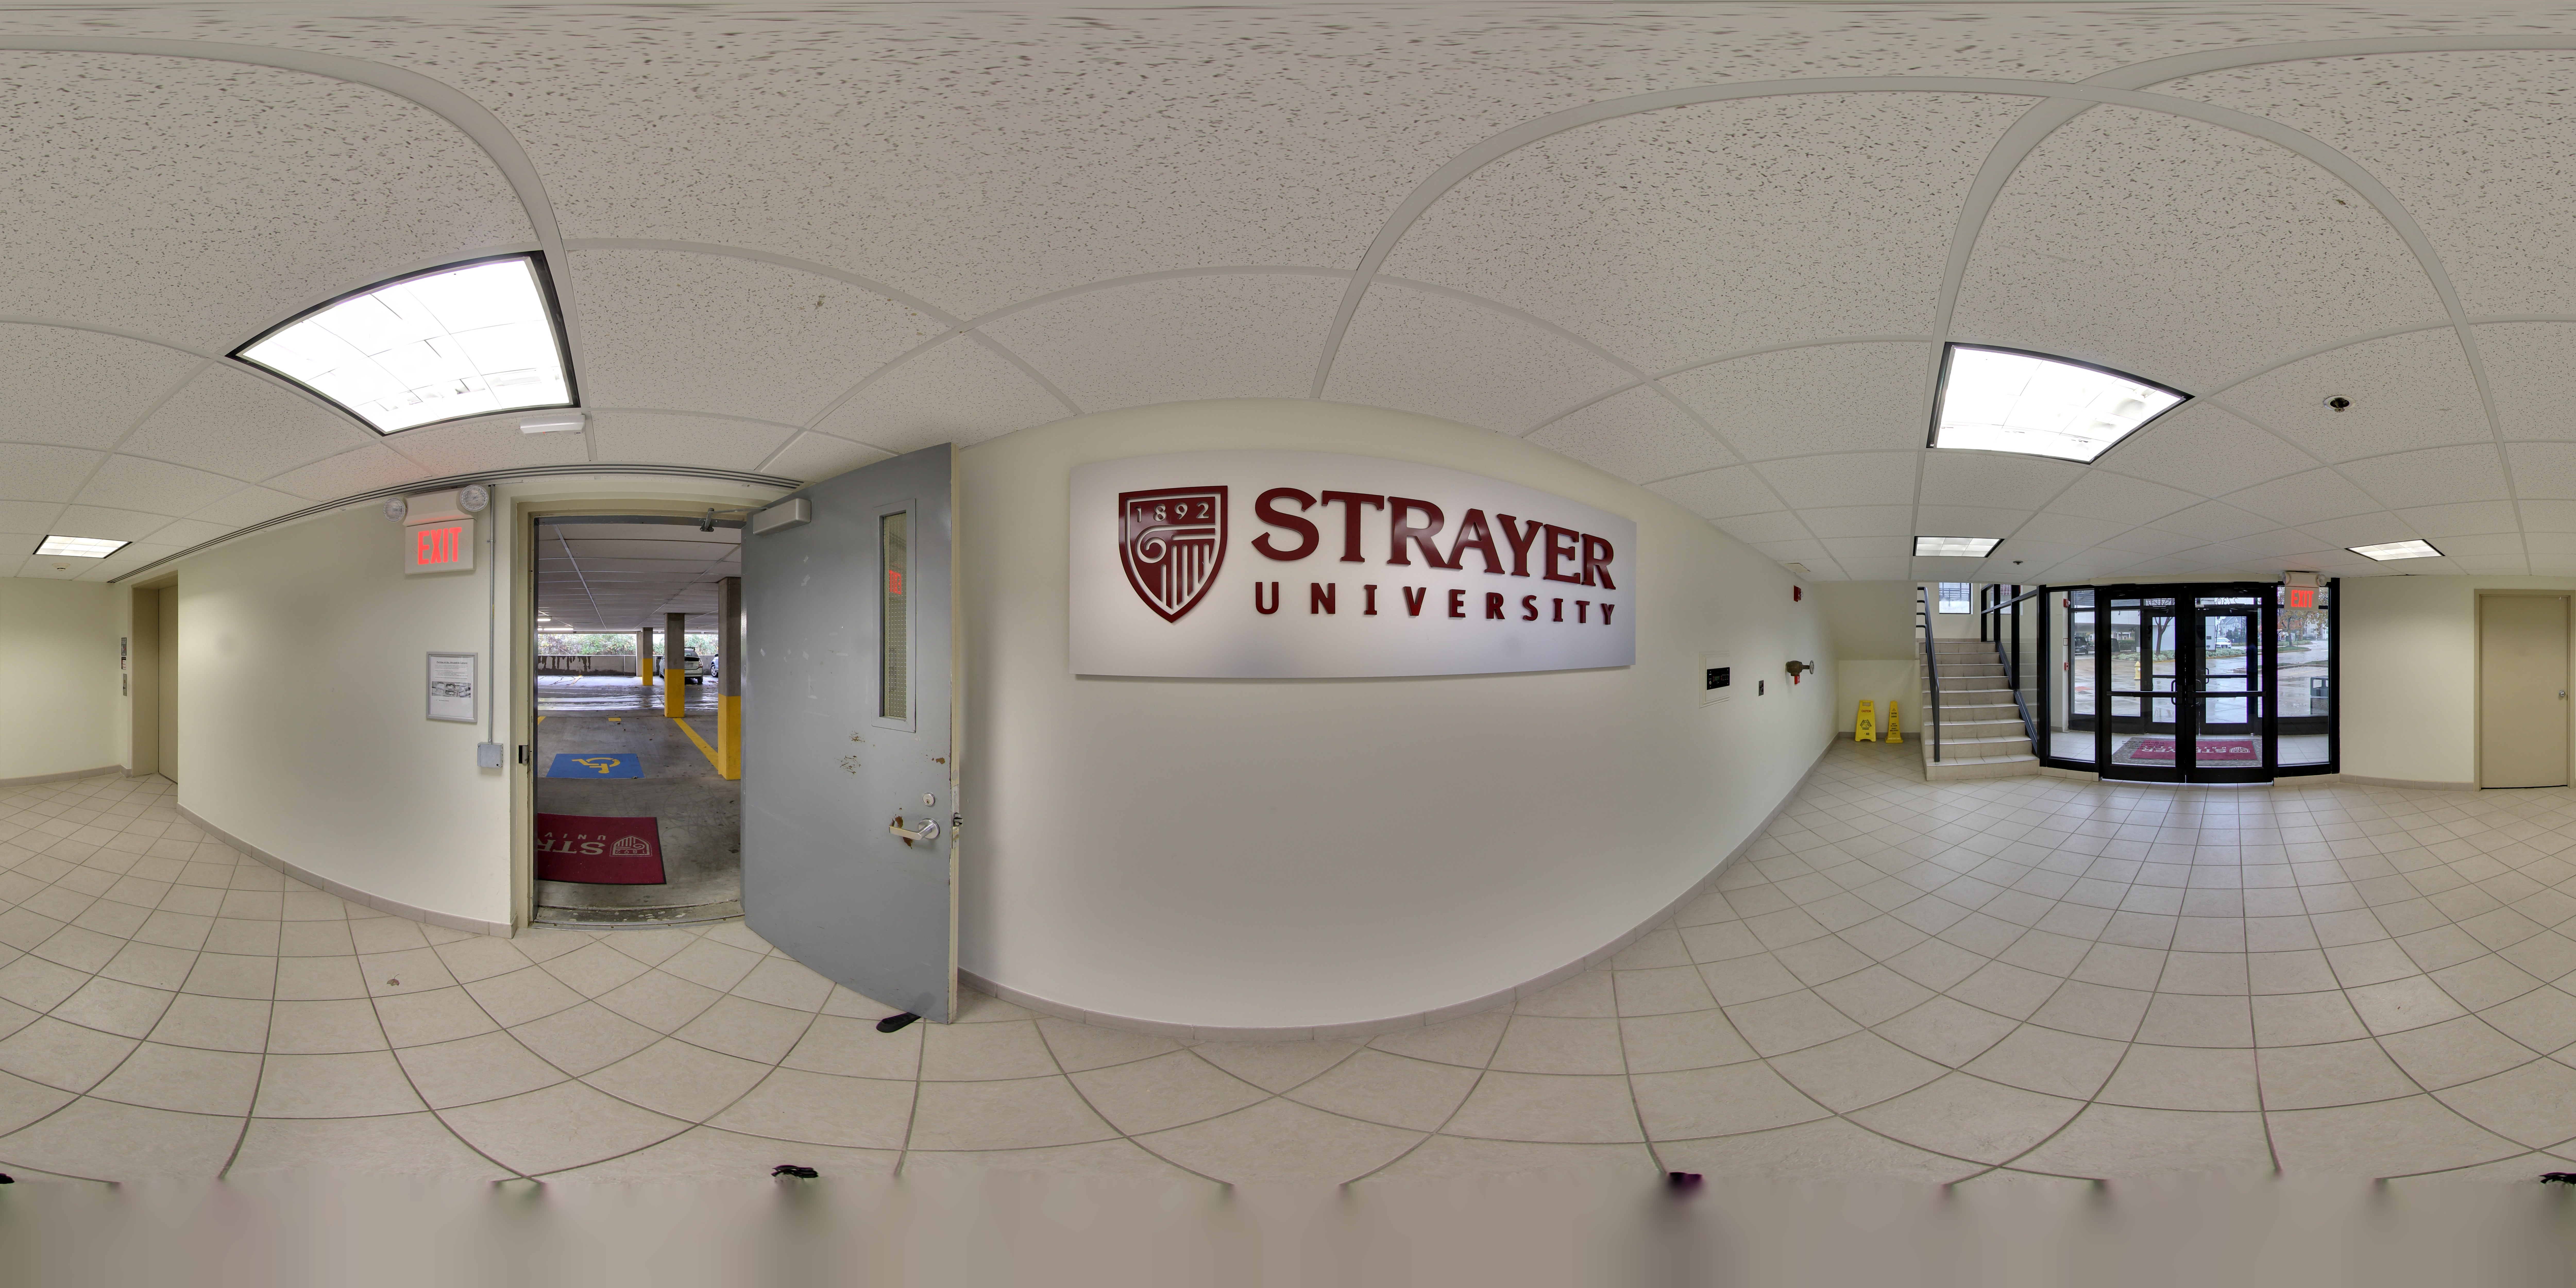 Strayer University image 11